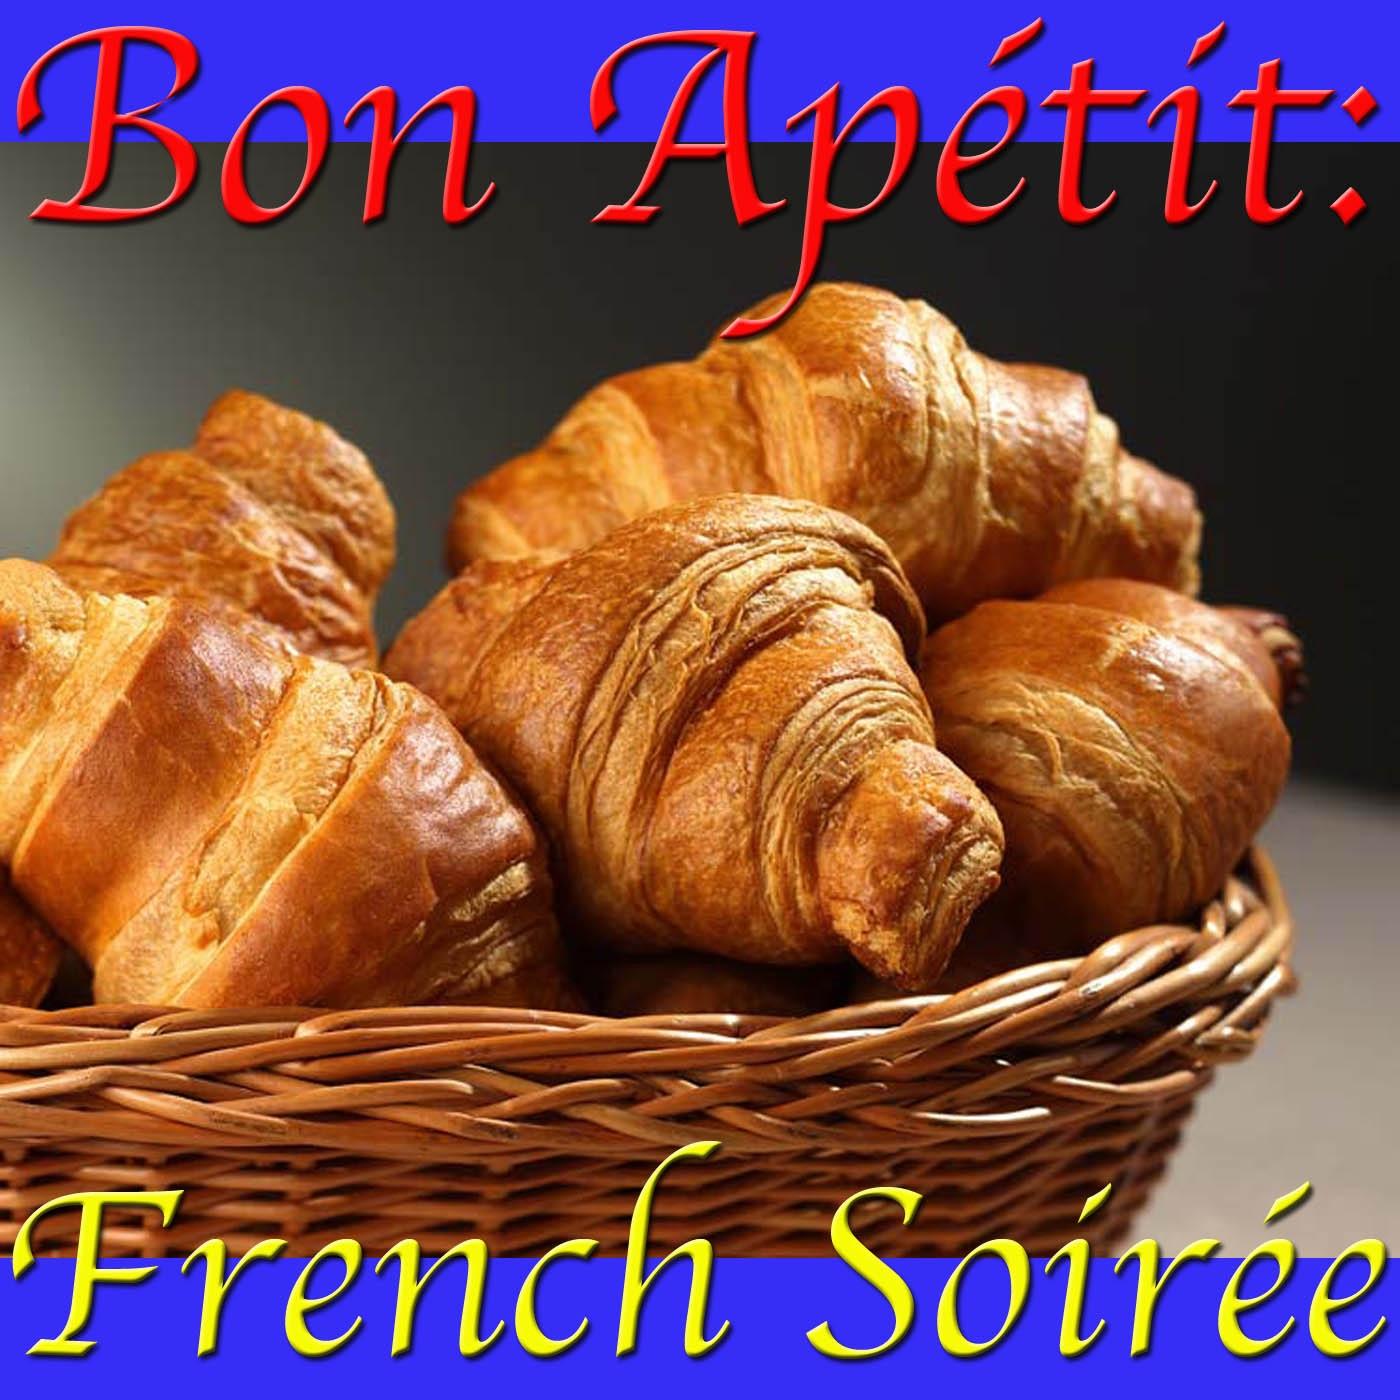 Bon Apétit: French Soirée